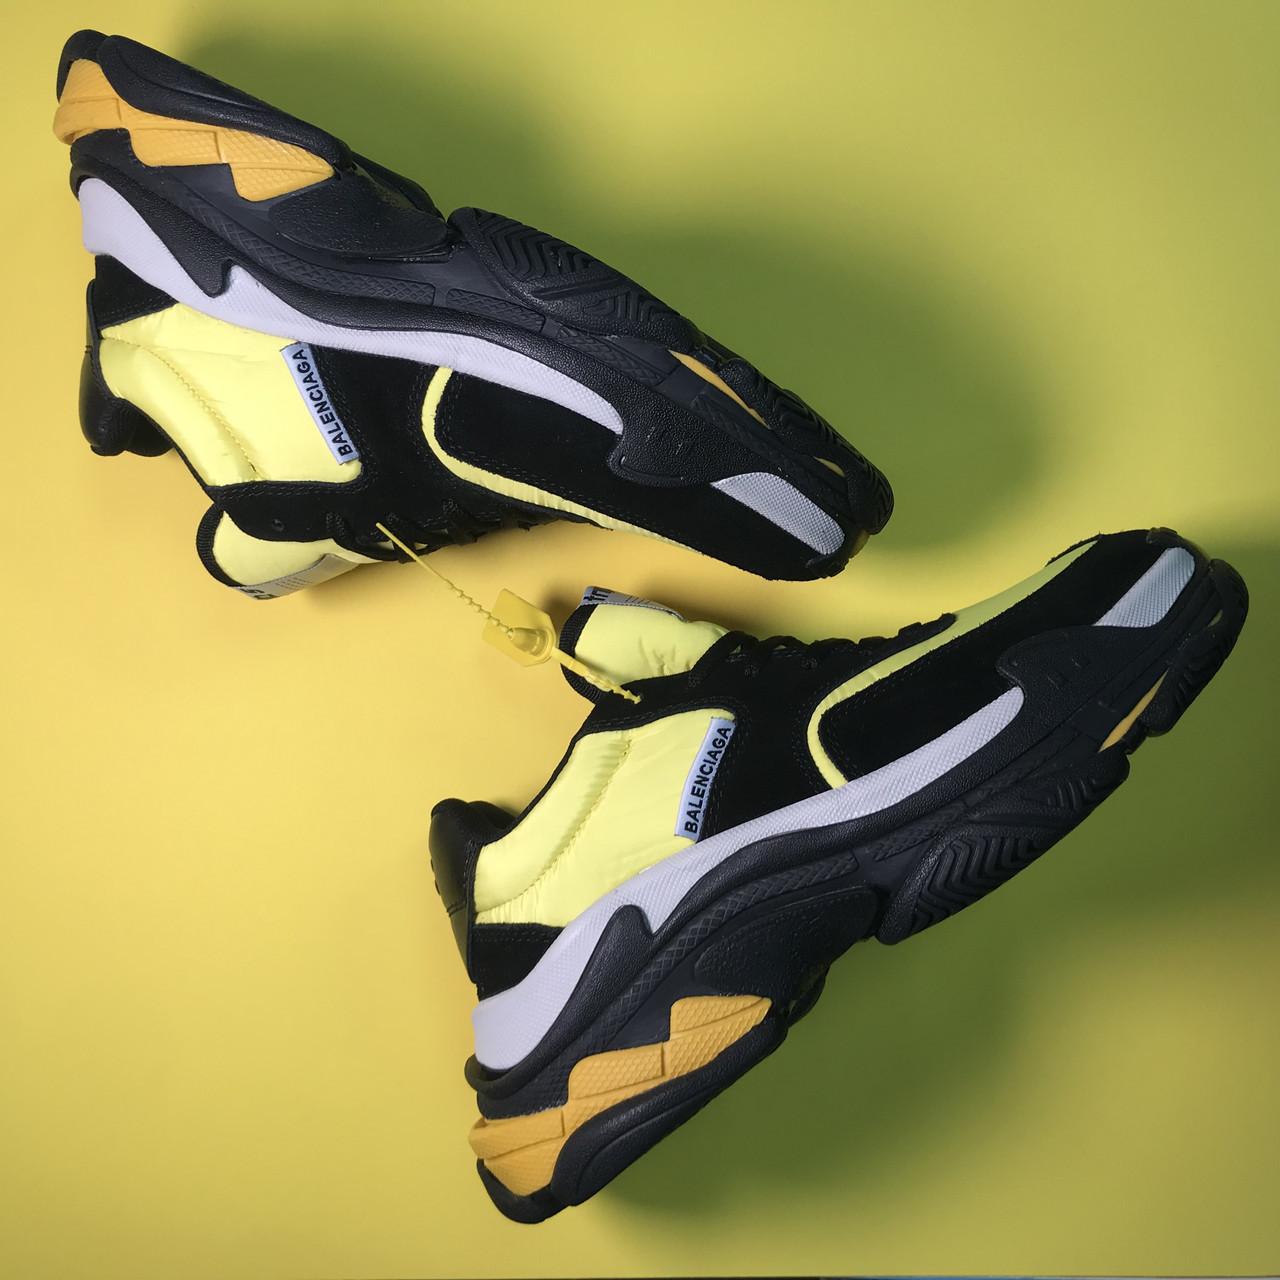 Кроссовки Balenciaga Triple S V2 Black Yellow